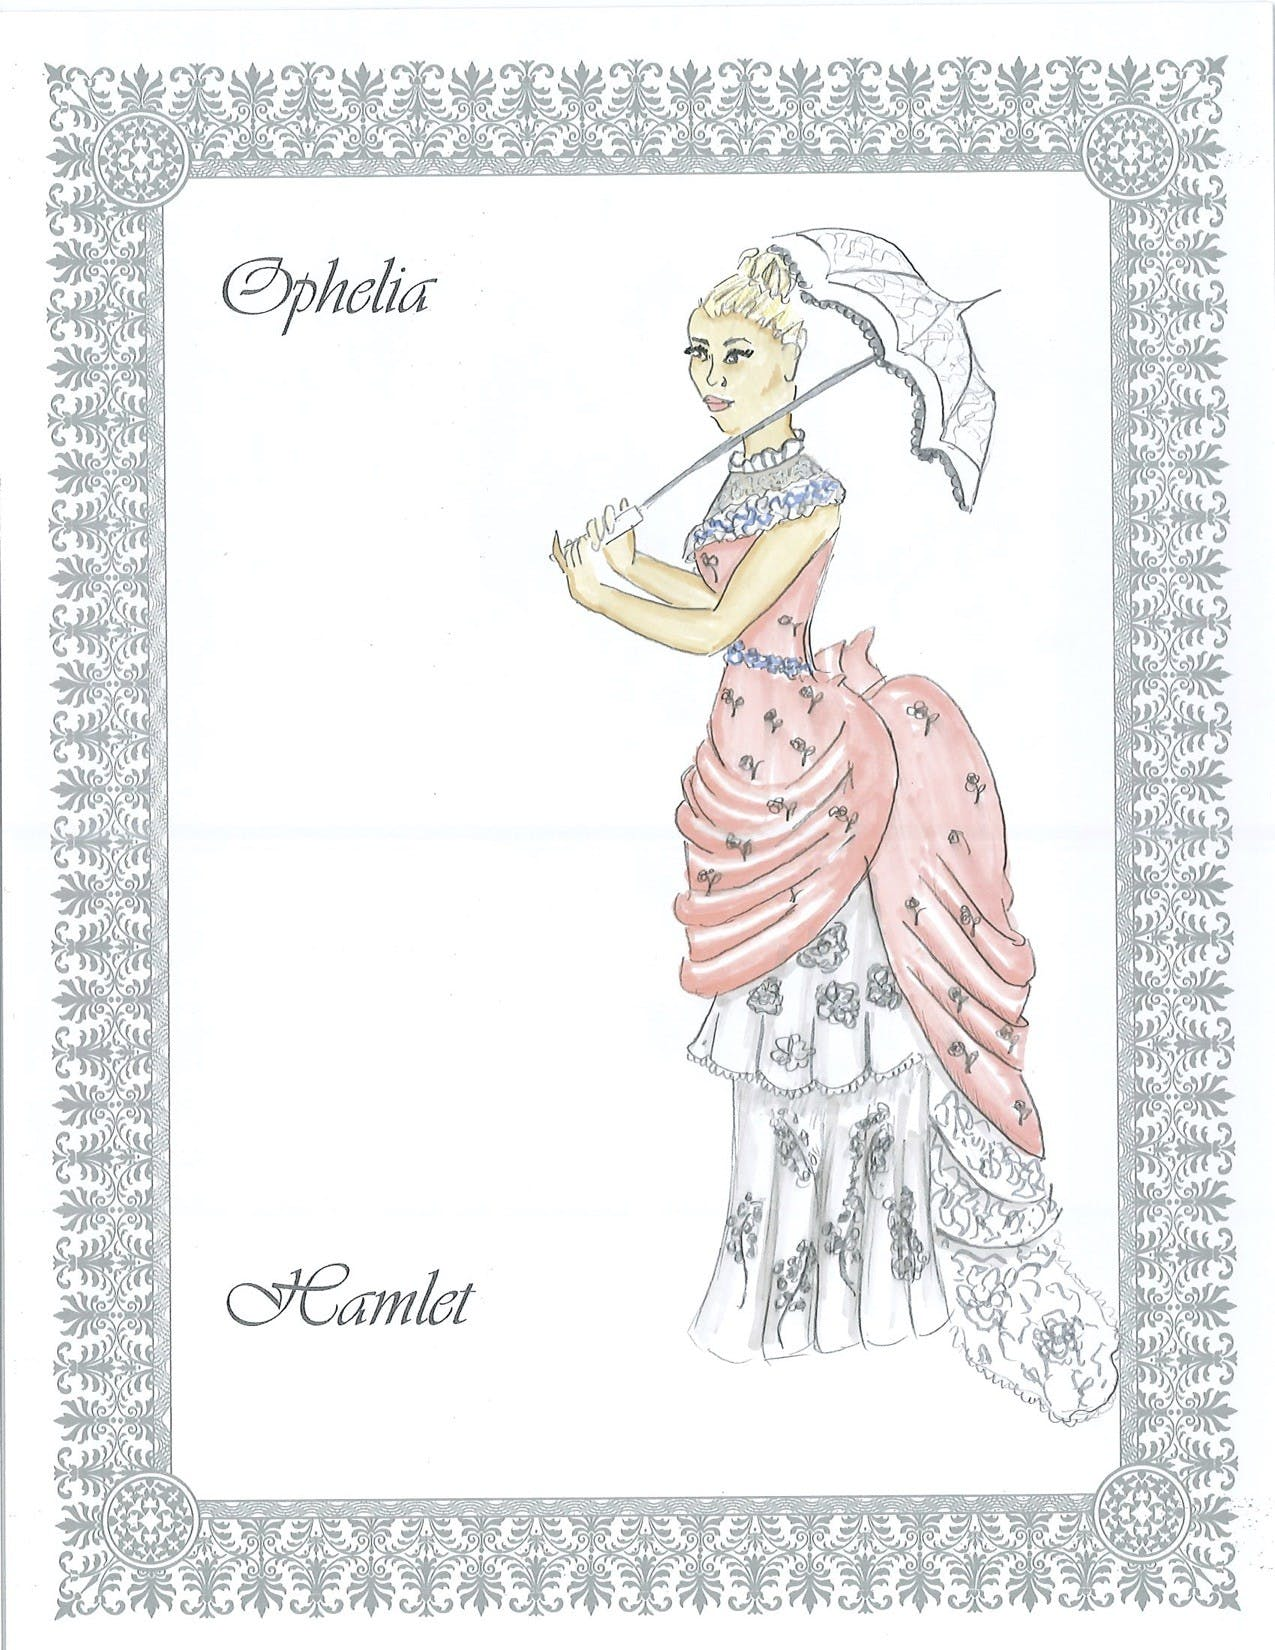 Ophelia costume design